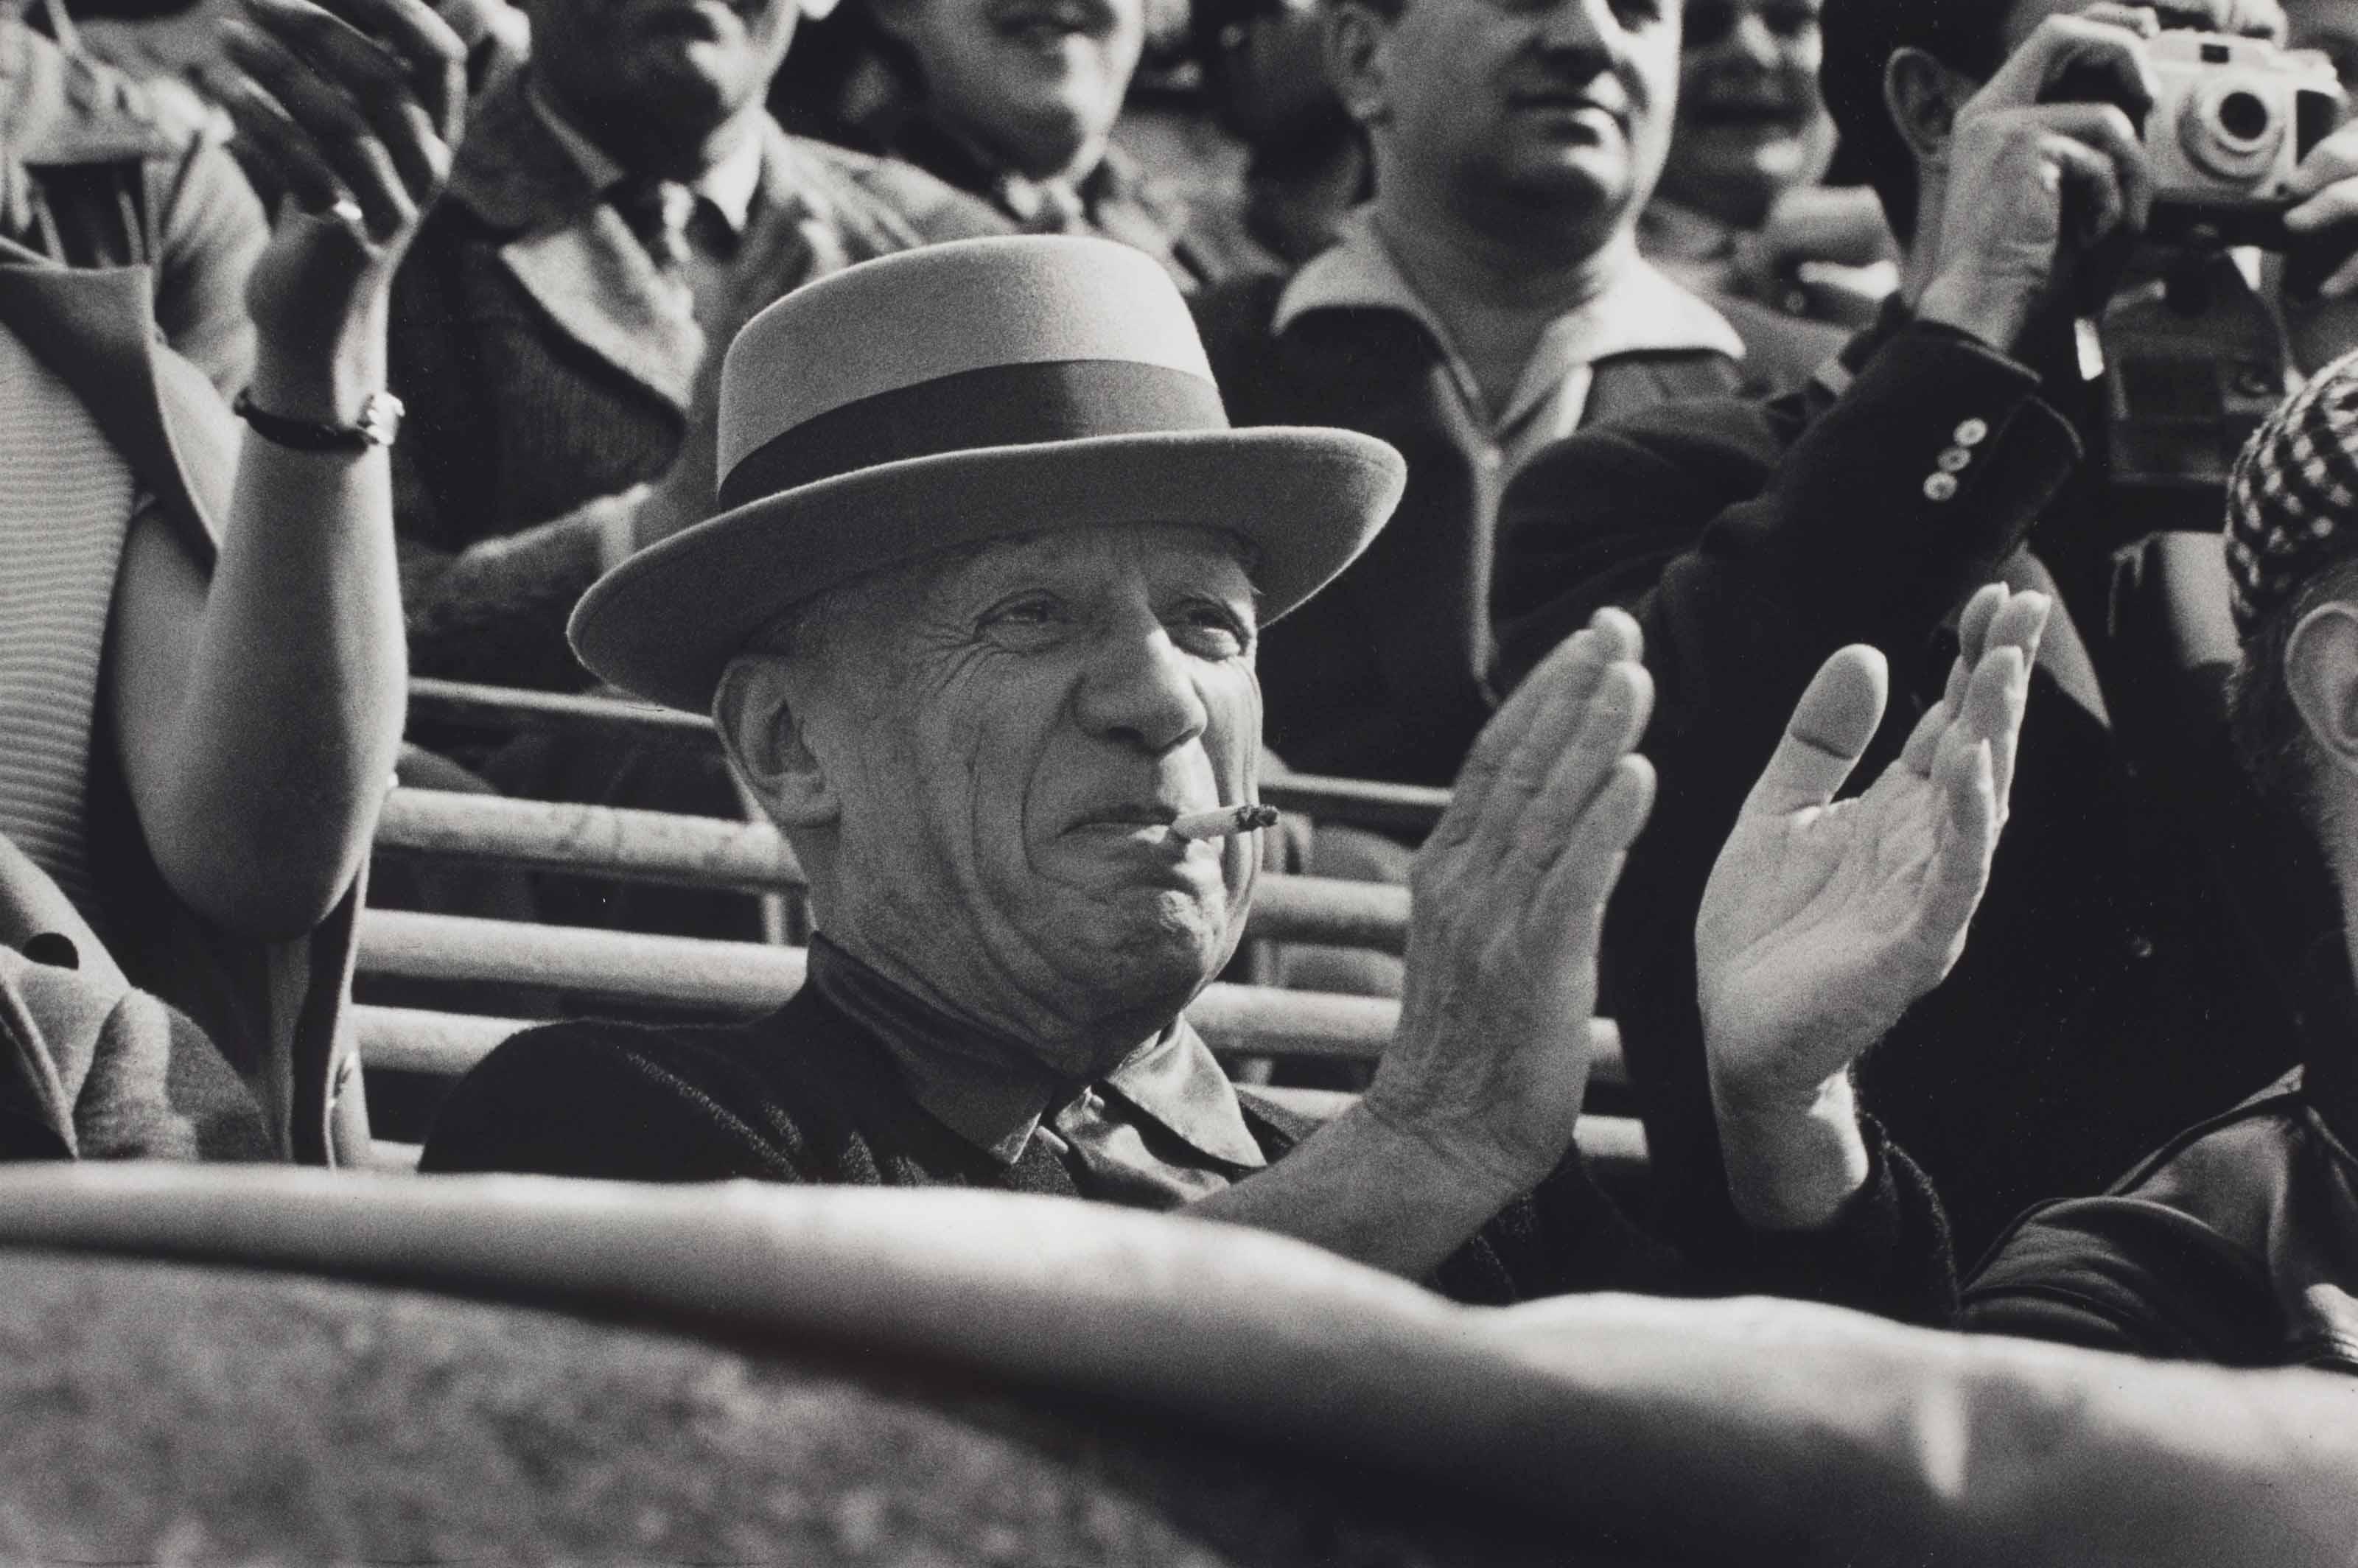 Pablo Picasso, Nîmes France, 1957